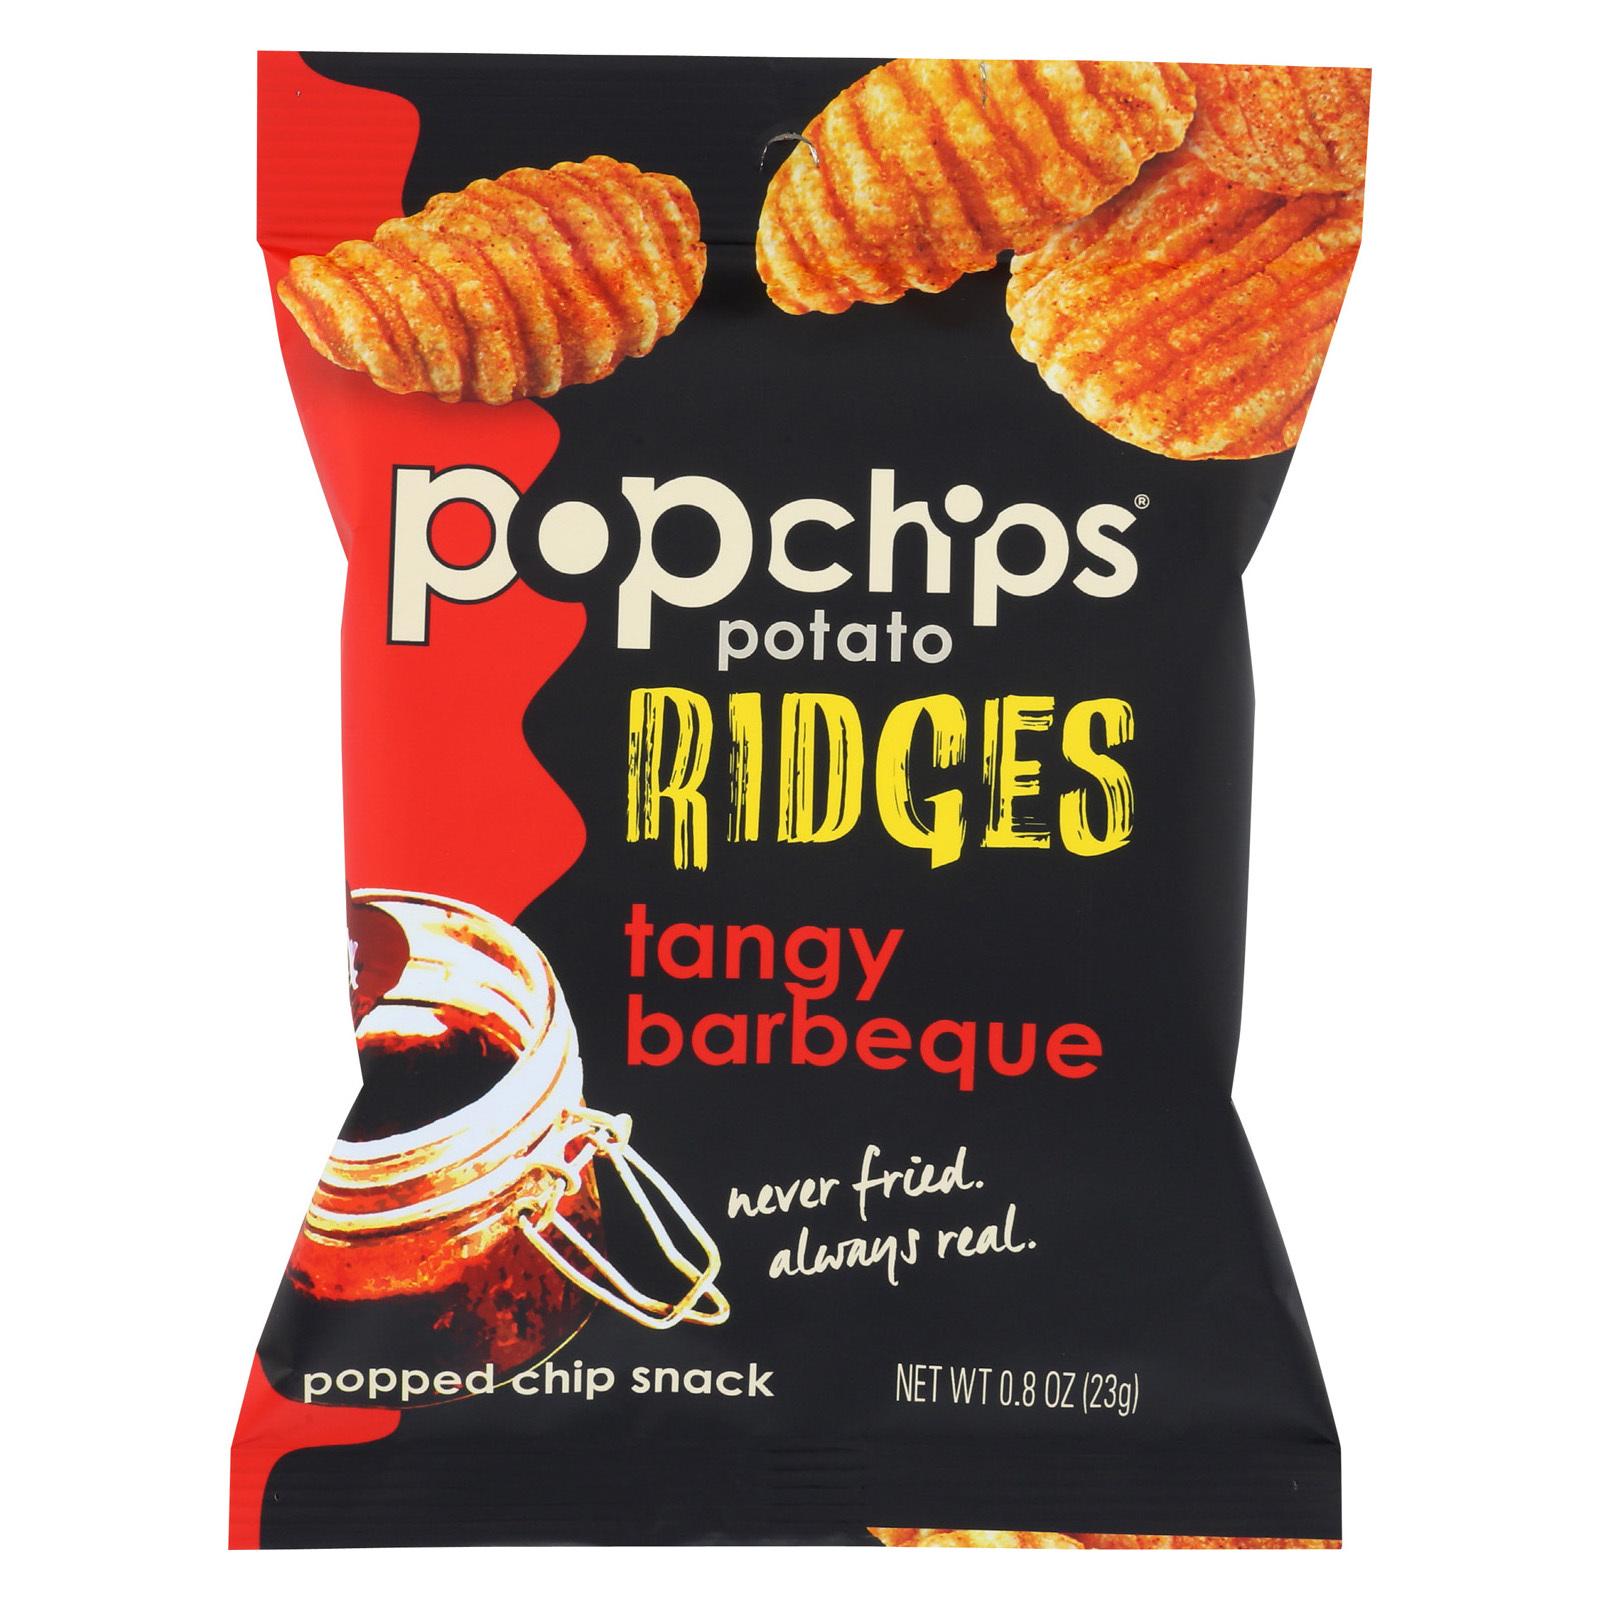 Popchips Potato Chip - Ridges - Tangy BBQ - Case of 24 - .8 oz